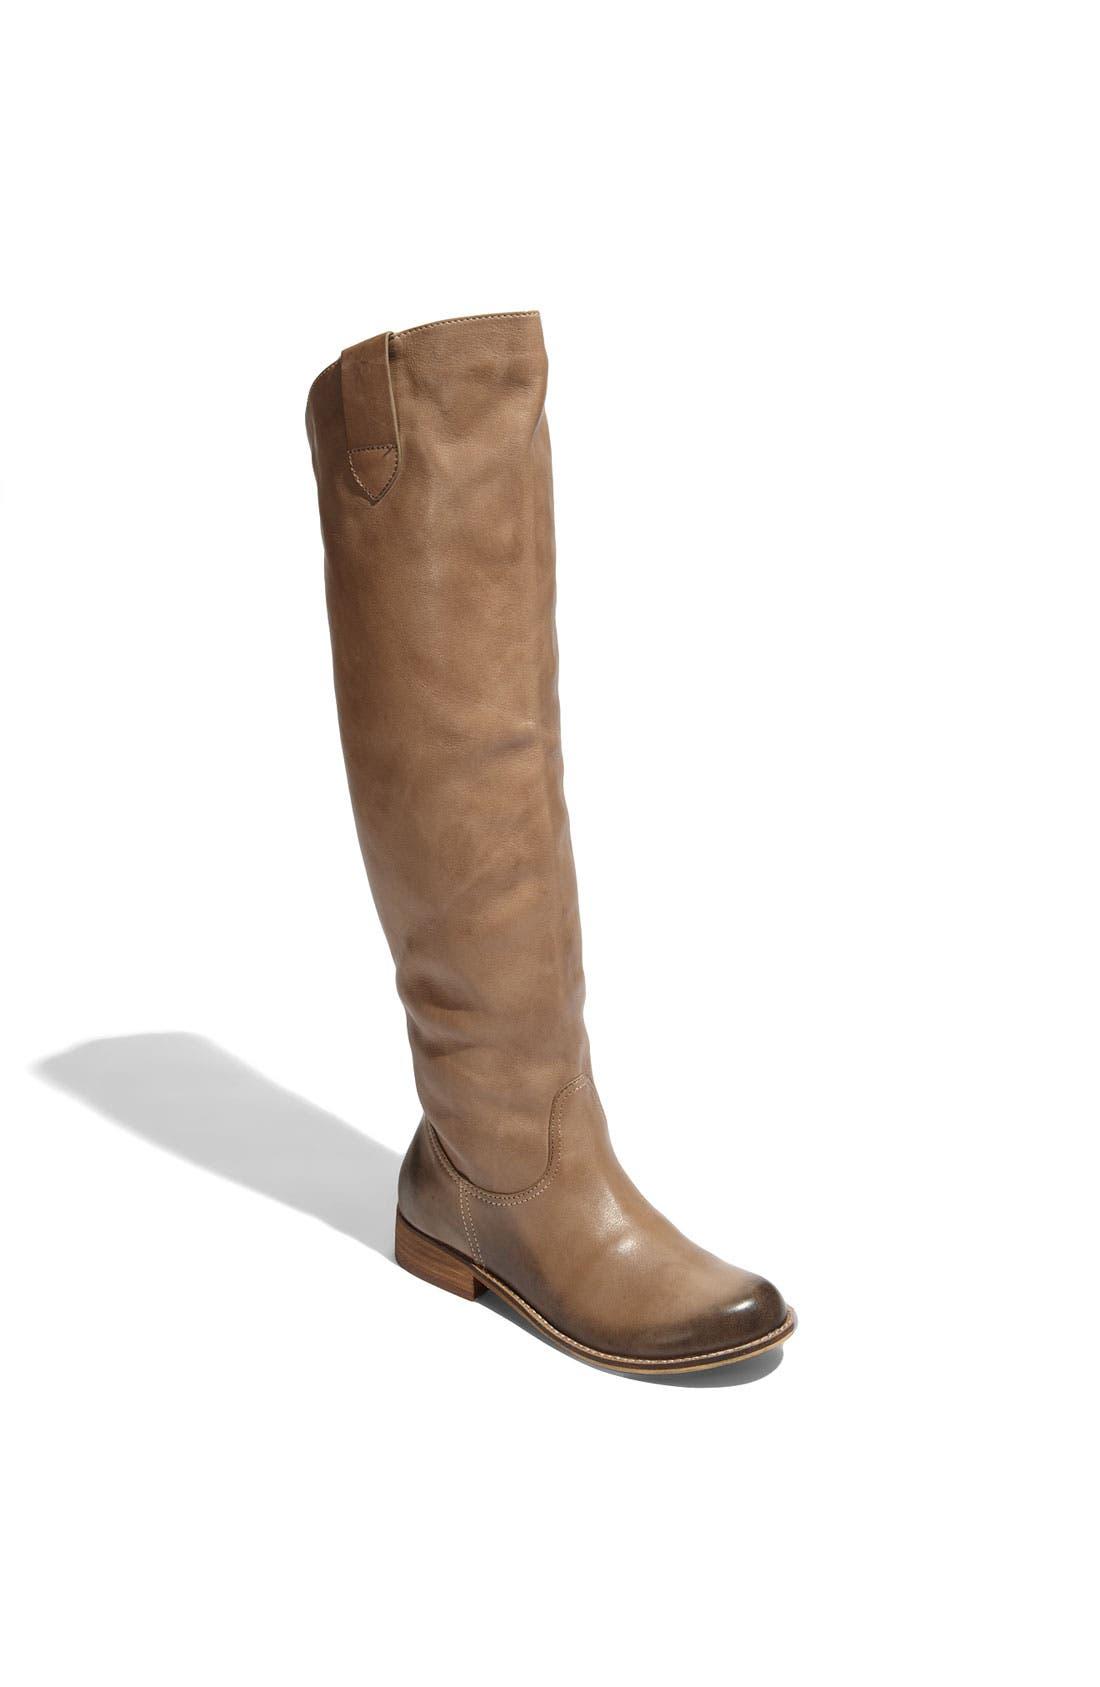 Alternate Image 1 Selected - BP. 'Ginger' Boot